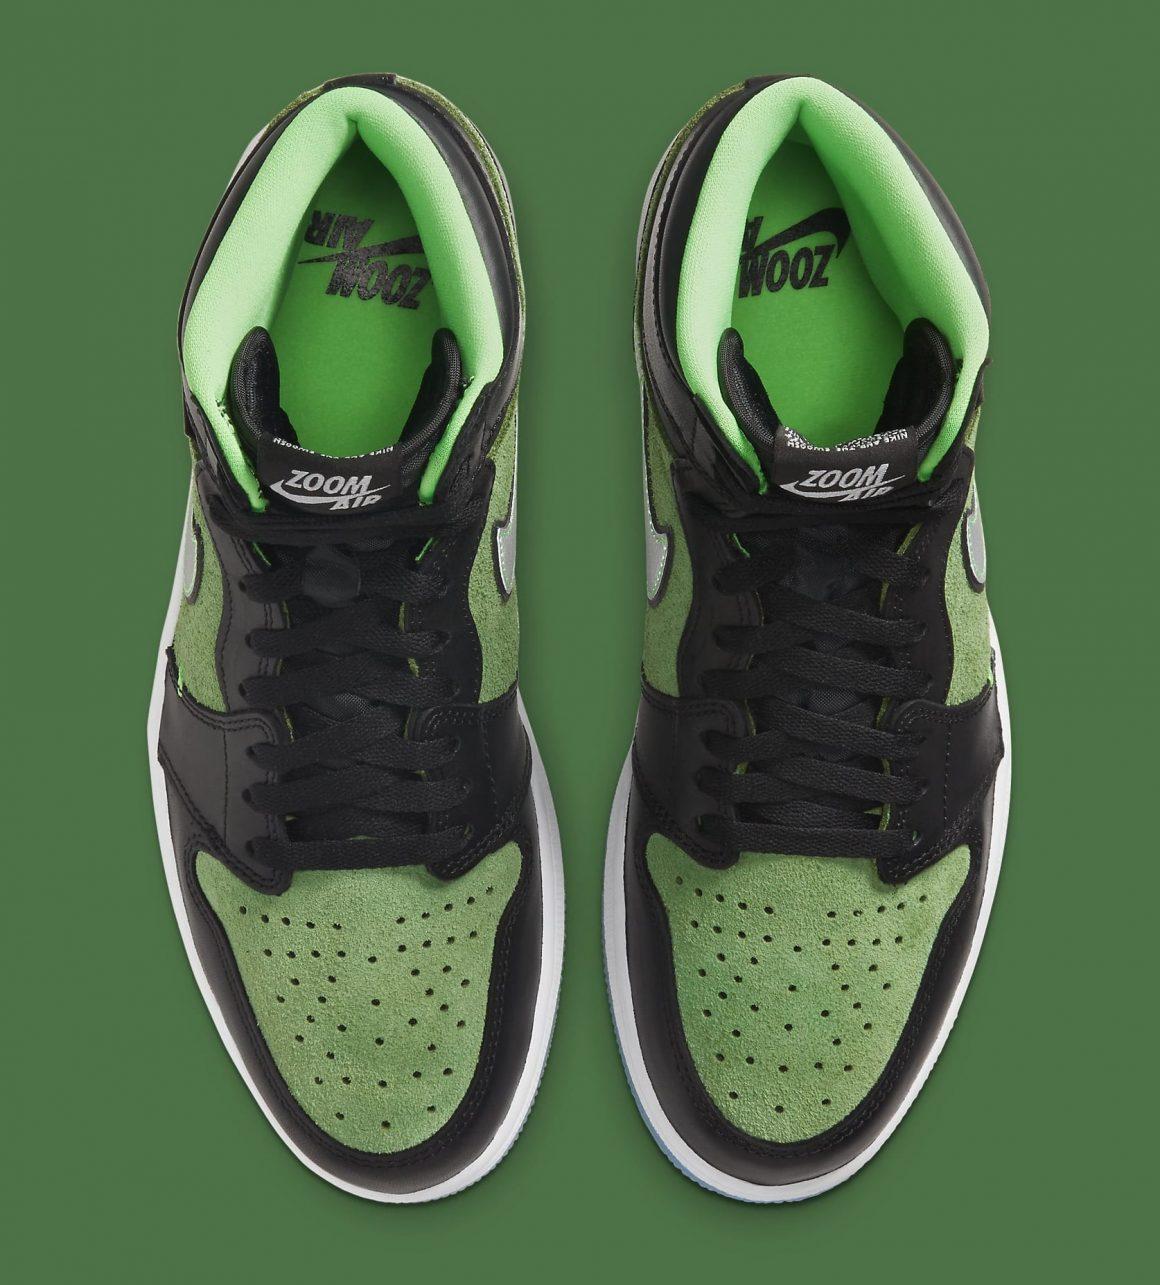 Air Jordan 1 Retro High Zoom ''Rage Green'' - CK6637-002